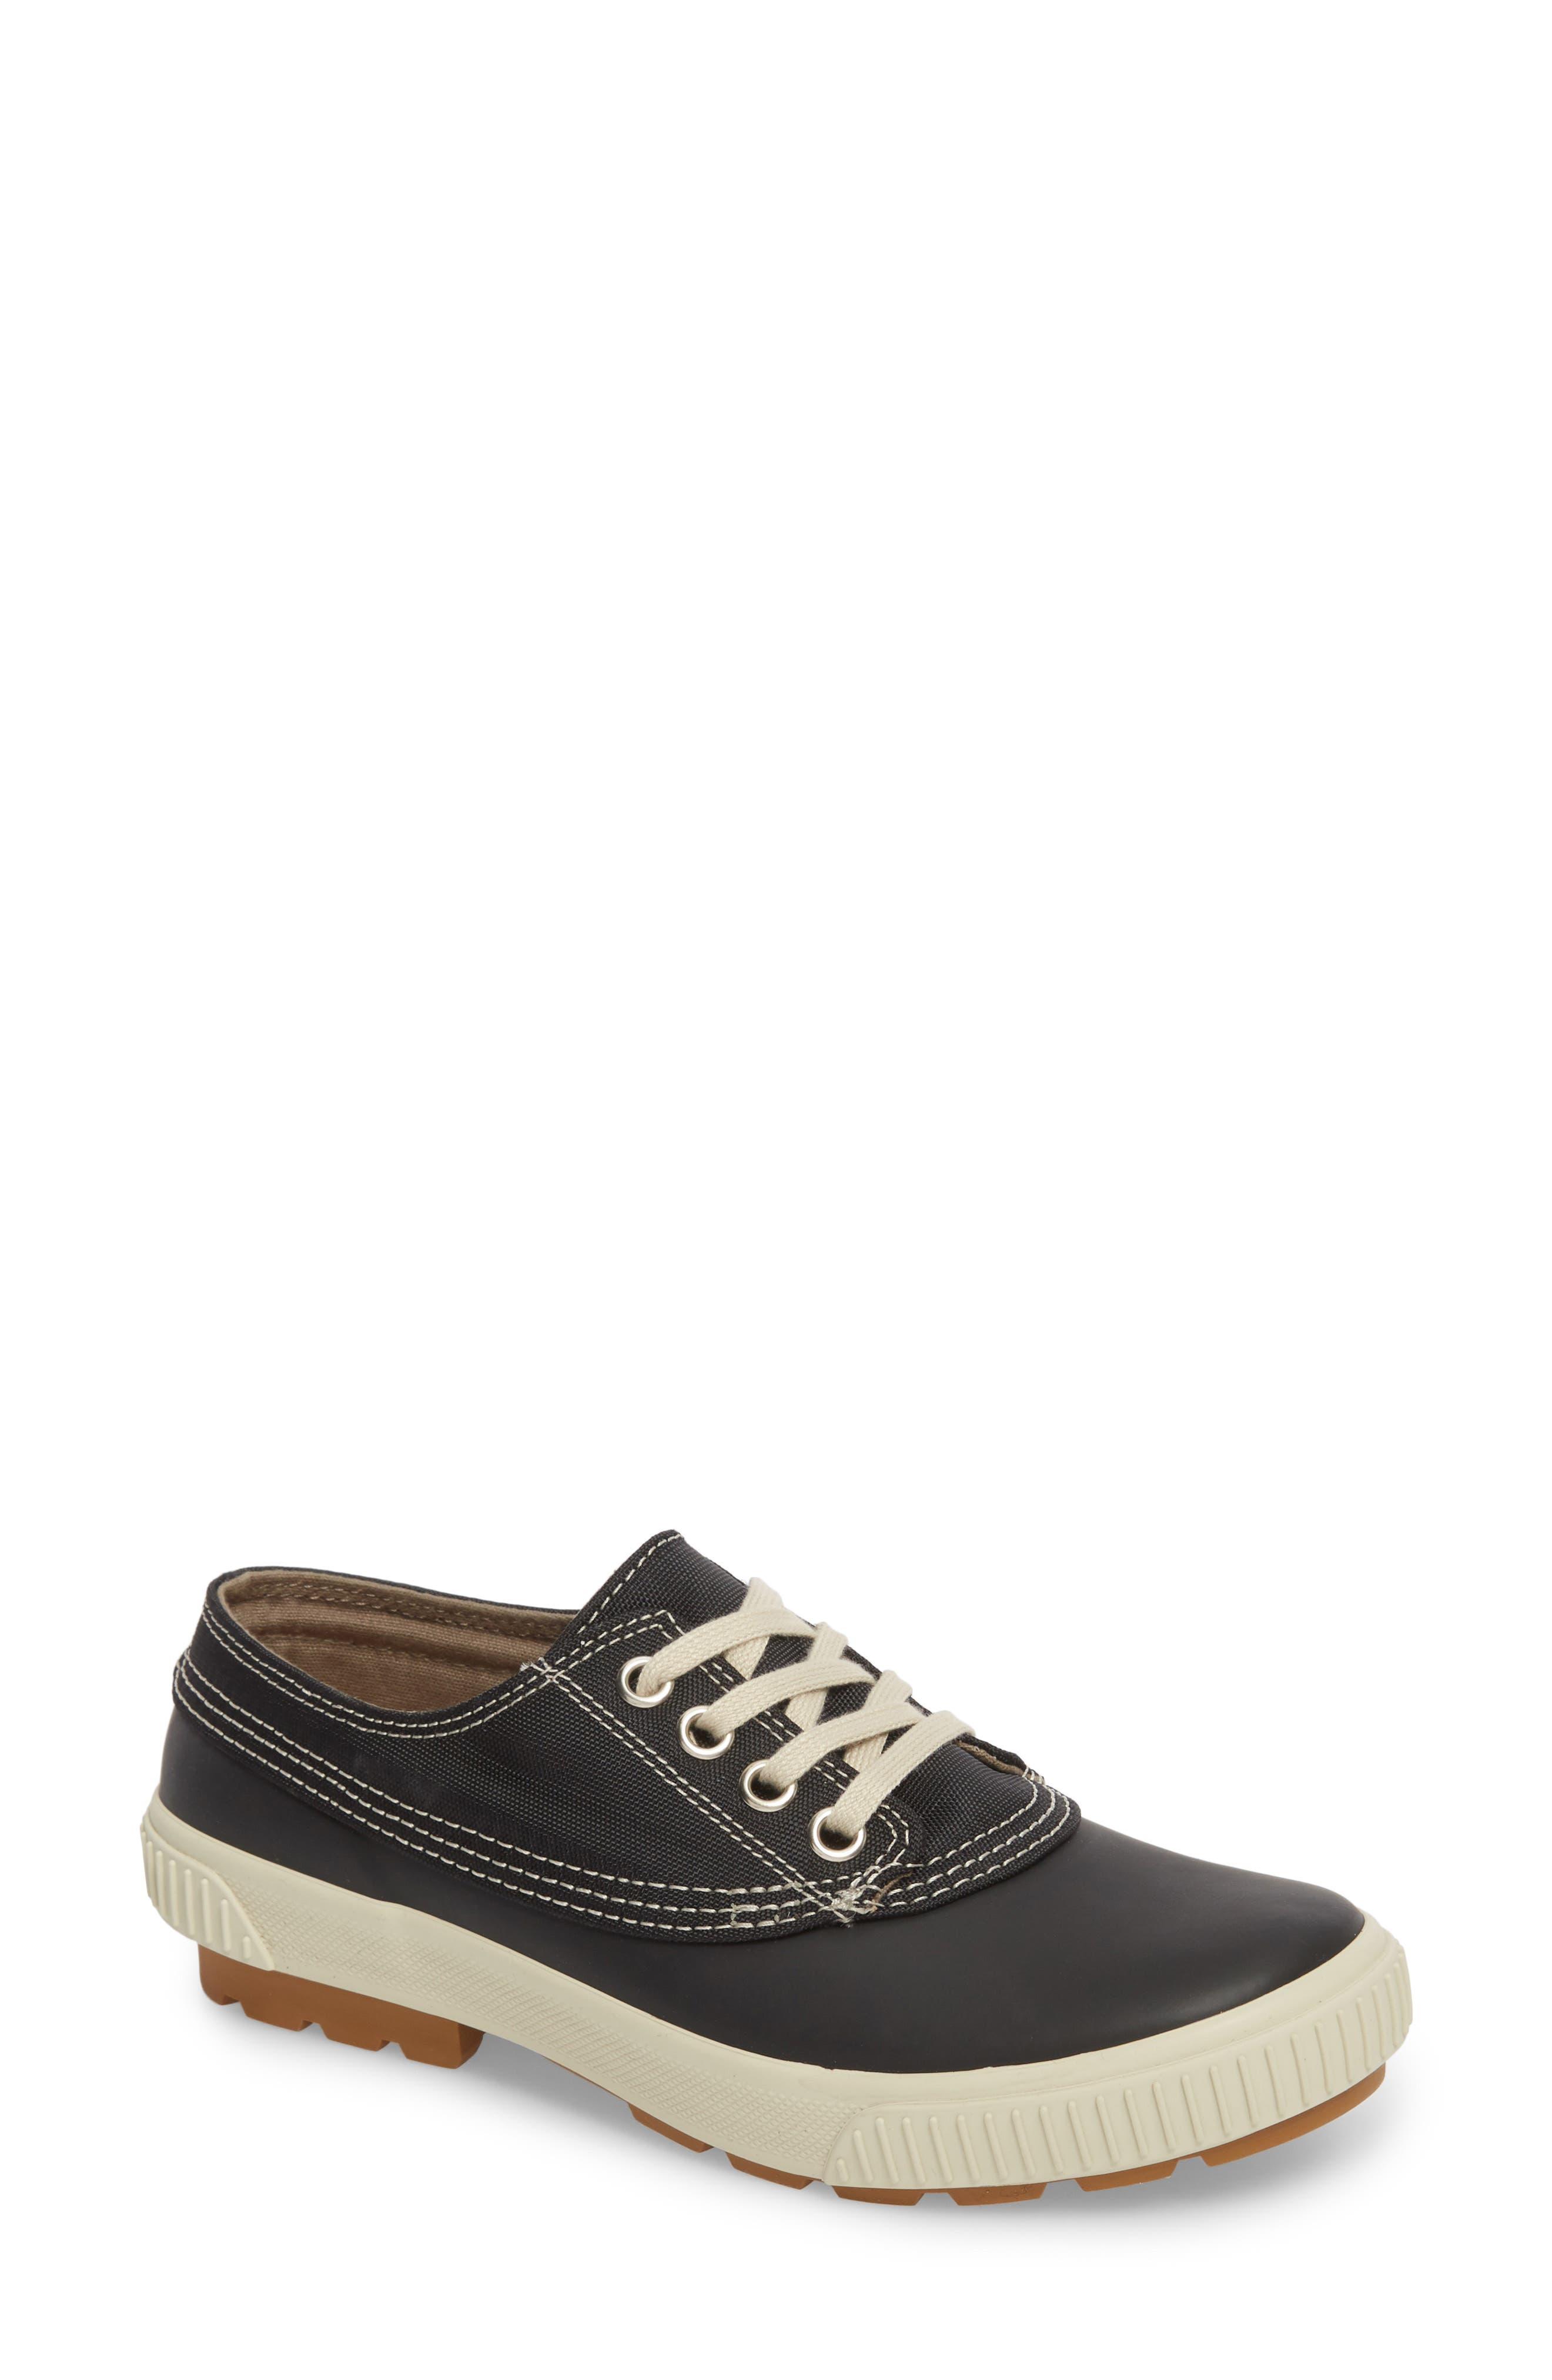 Dash Duck Sneaker,                             Main thumbnail 1, color,                             BLACK